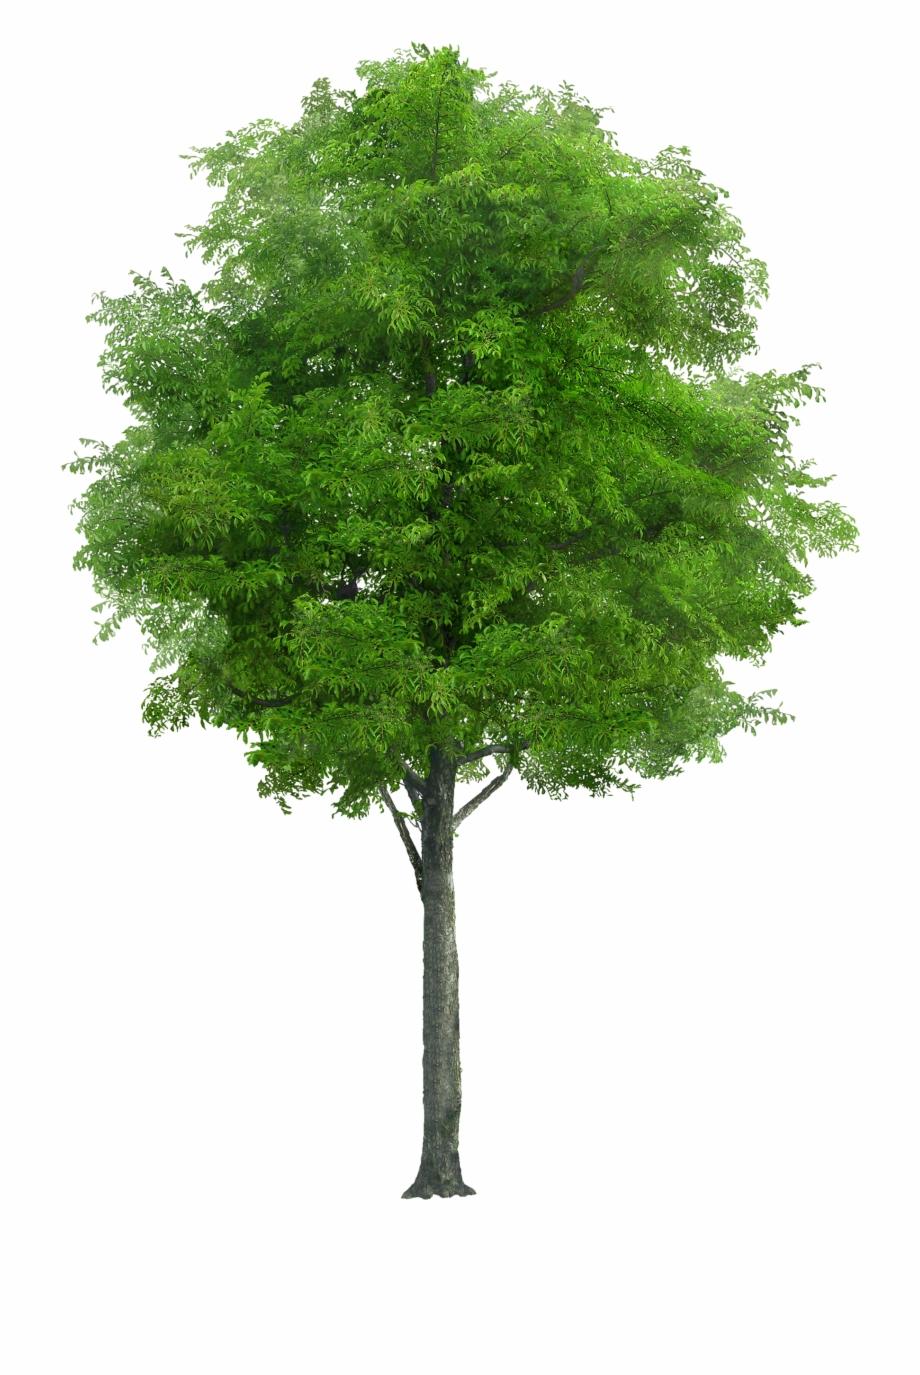 Tree Png Image Tree Plan Png, Tree Render, Tree Psd,.